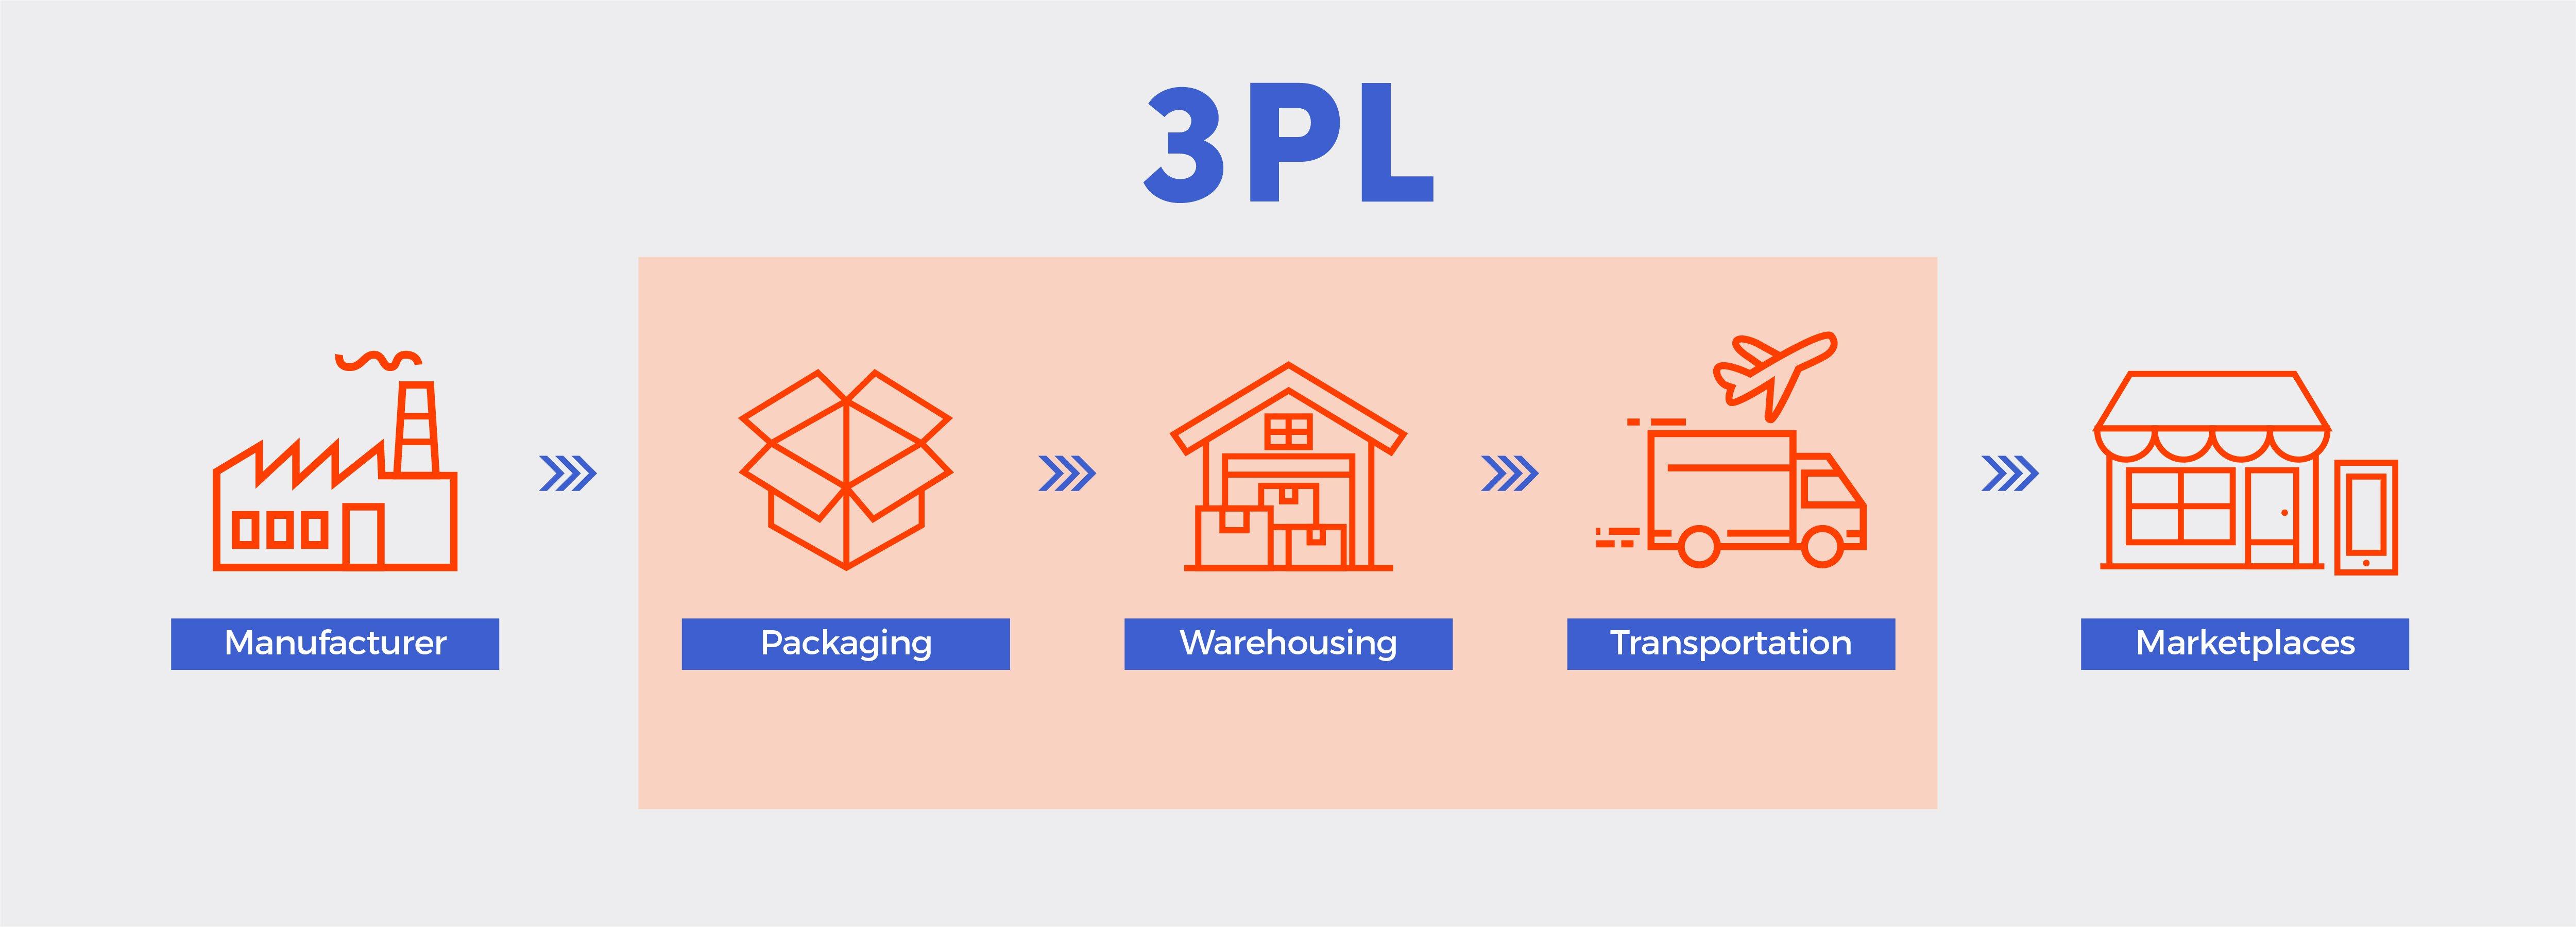 A 3PL Supply Chain Flowchart